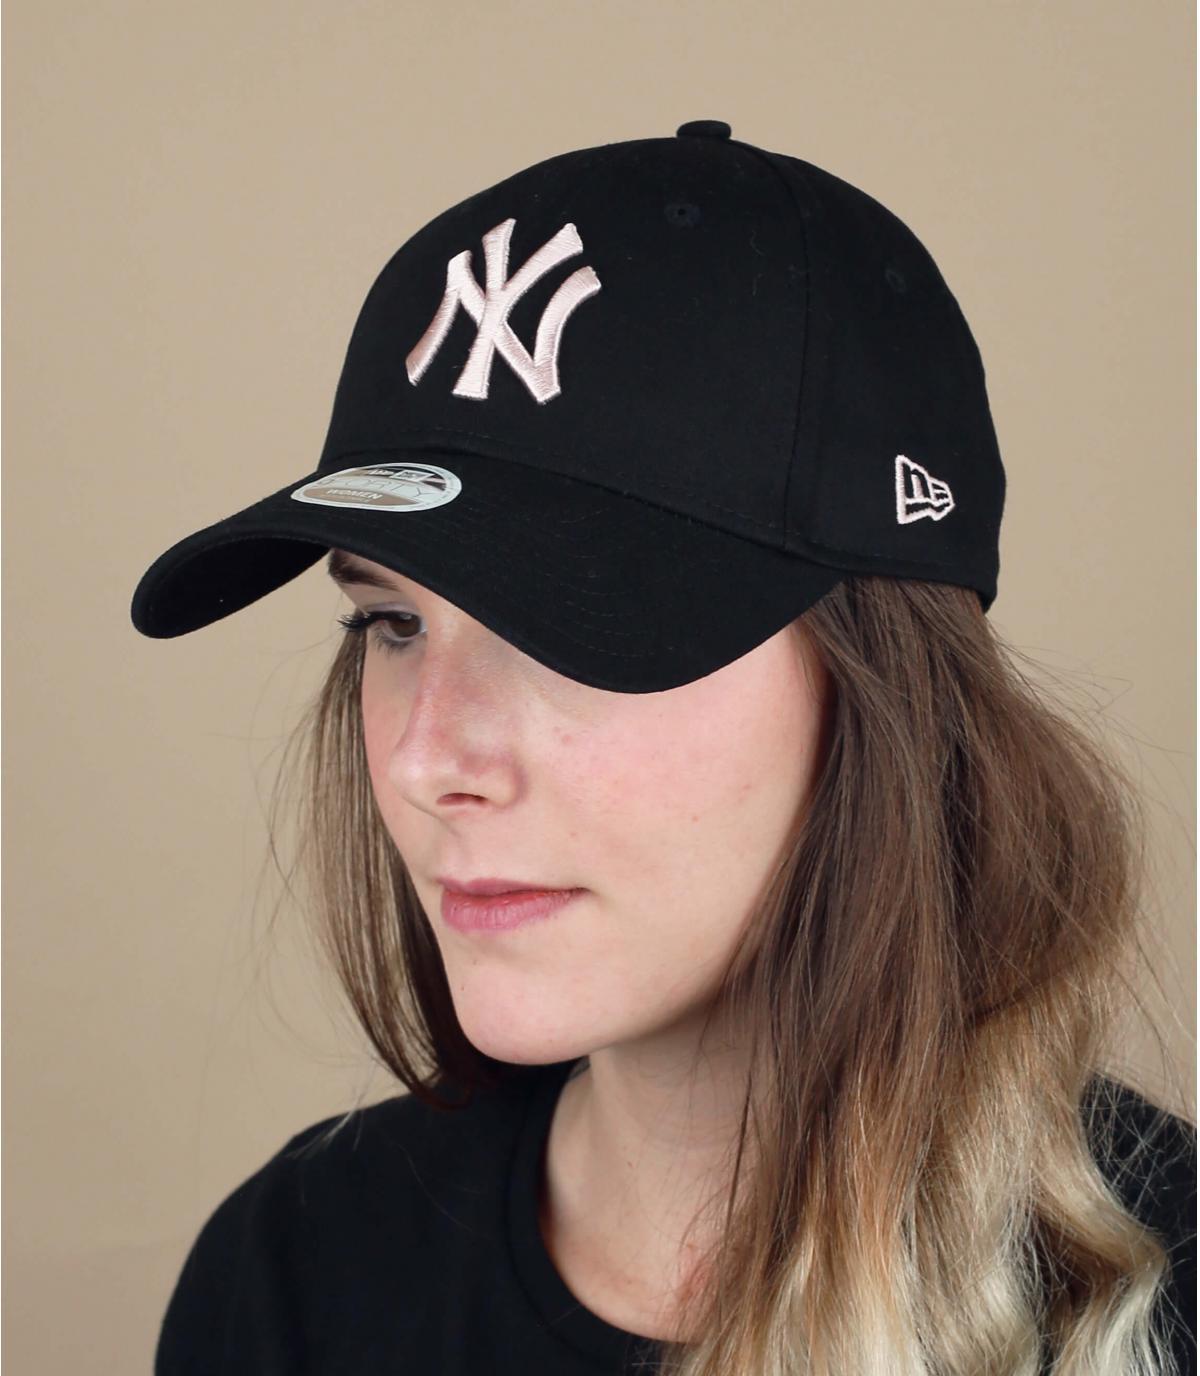 women NY cap black pink